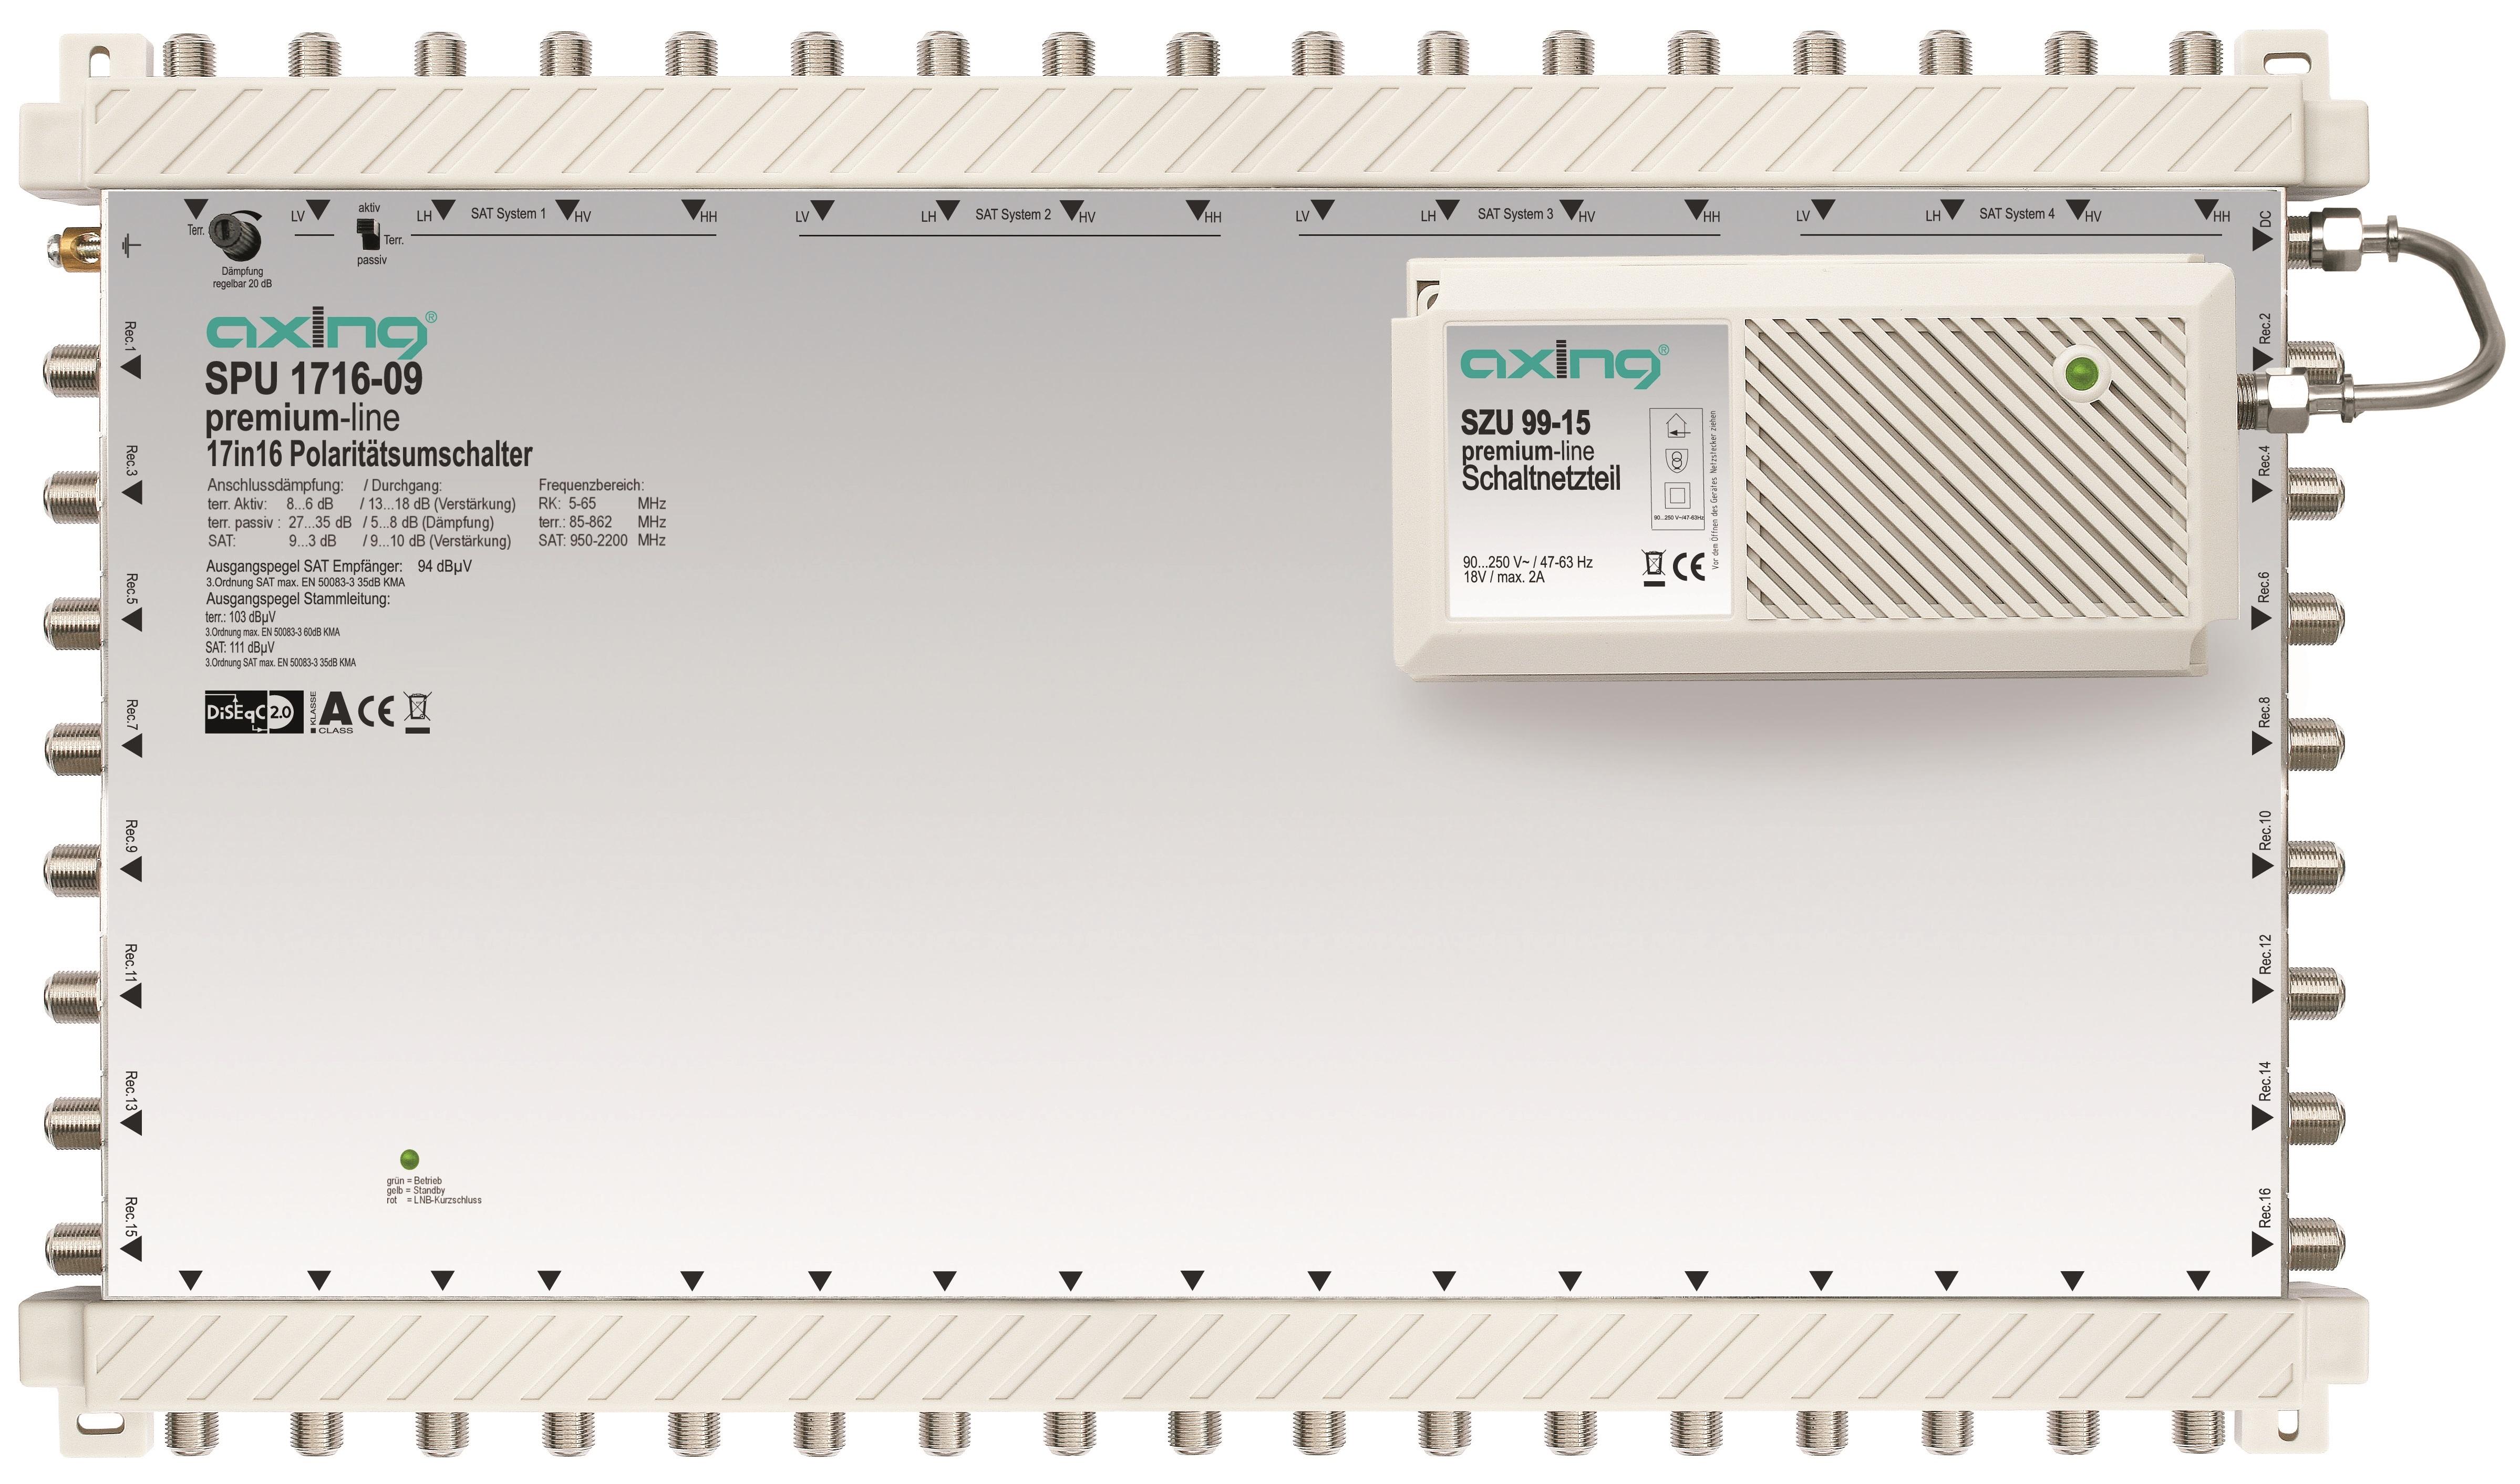 1 Stk SAT Multischalter 17 in 16, kaskadierbar, SPU 1716-09 HSATS1716A